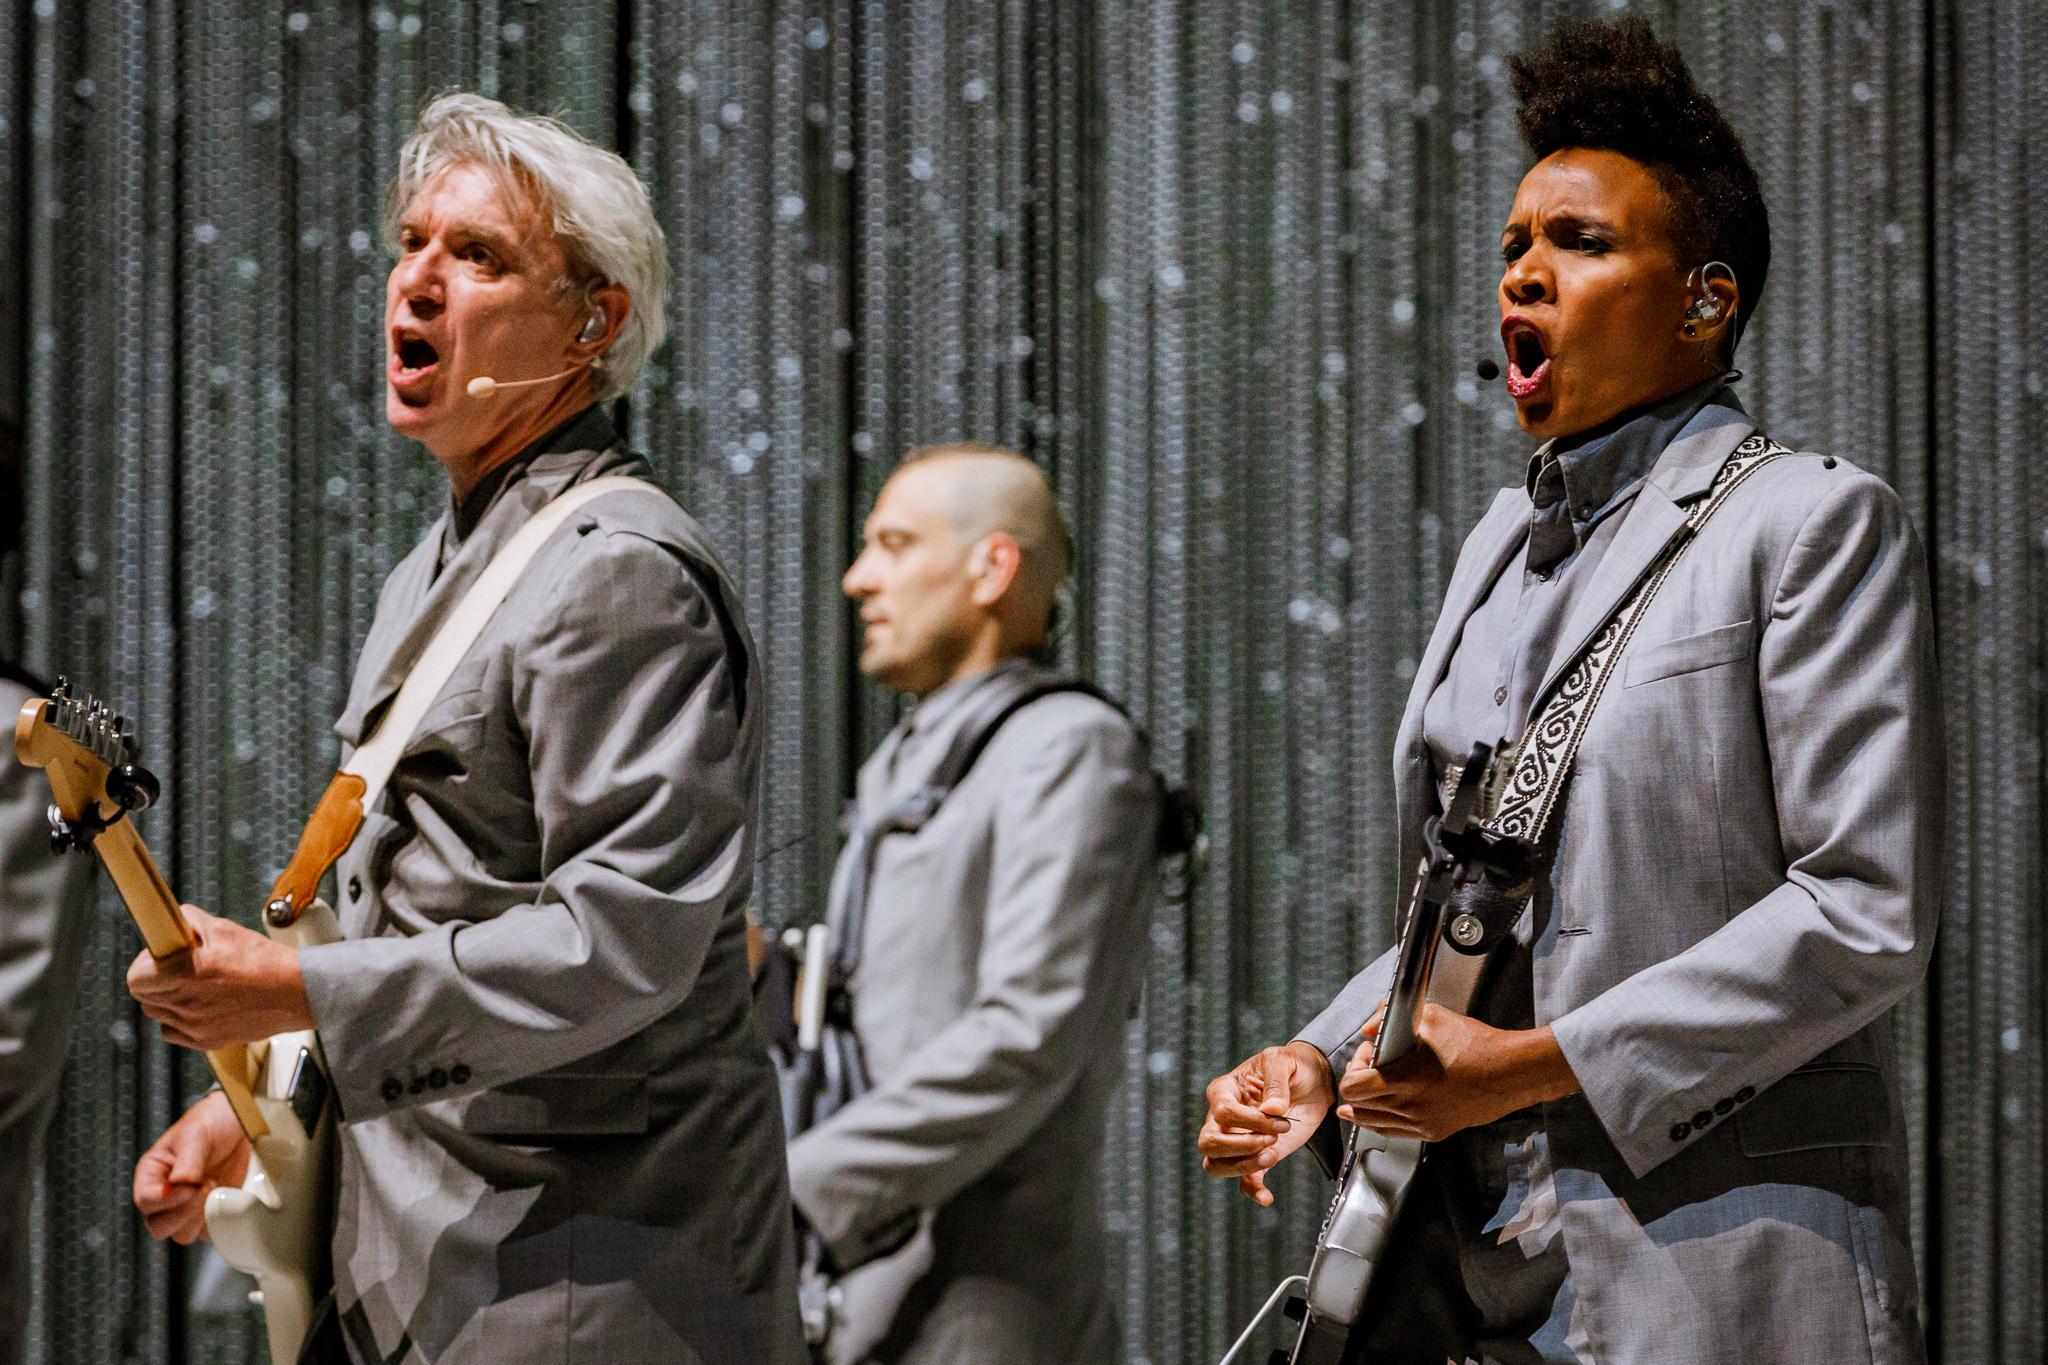 David Byrne performing at The Anthem in Washington, DC - 5/12/2018 (photo by Matt Condon / @arcane93)